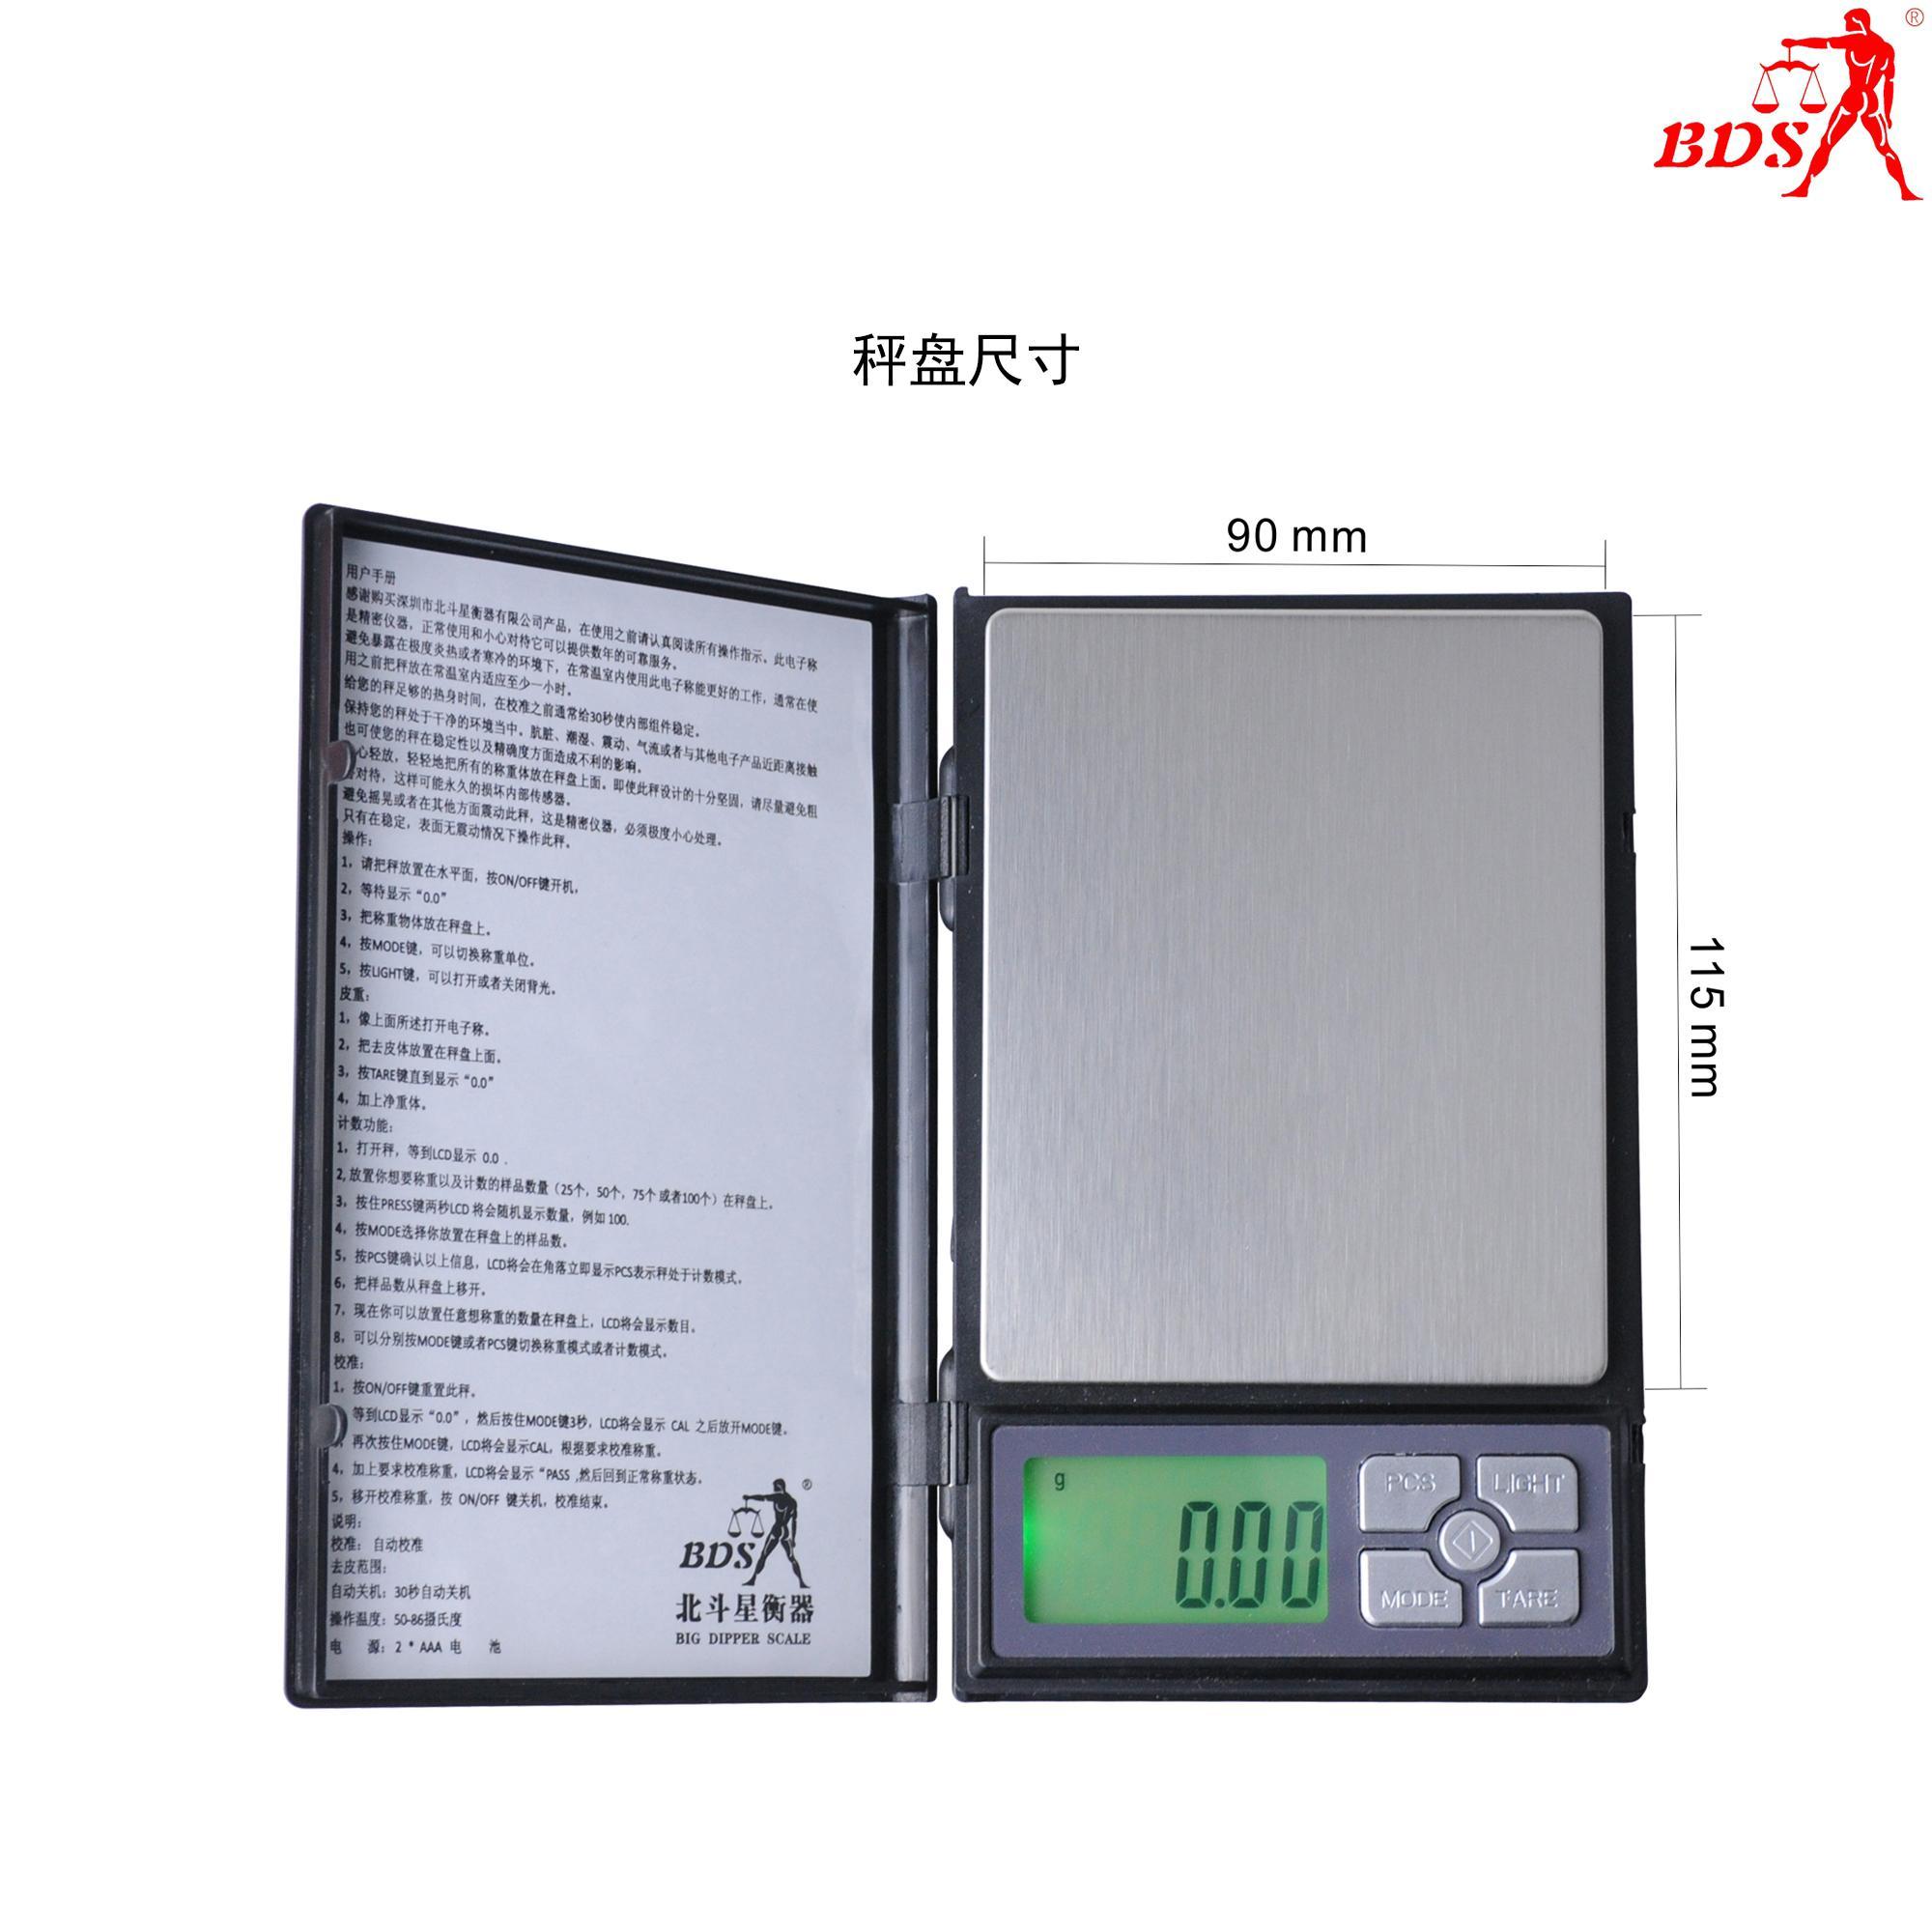 big pocket scale 2